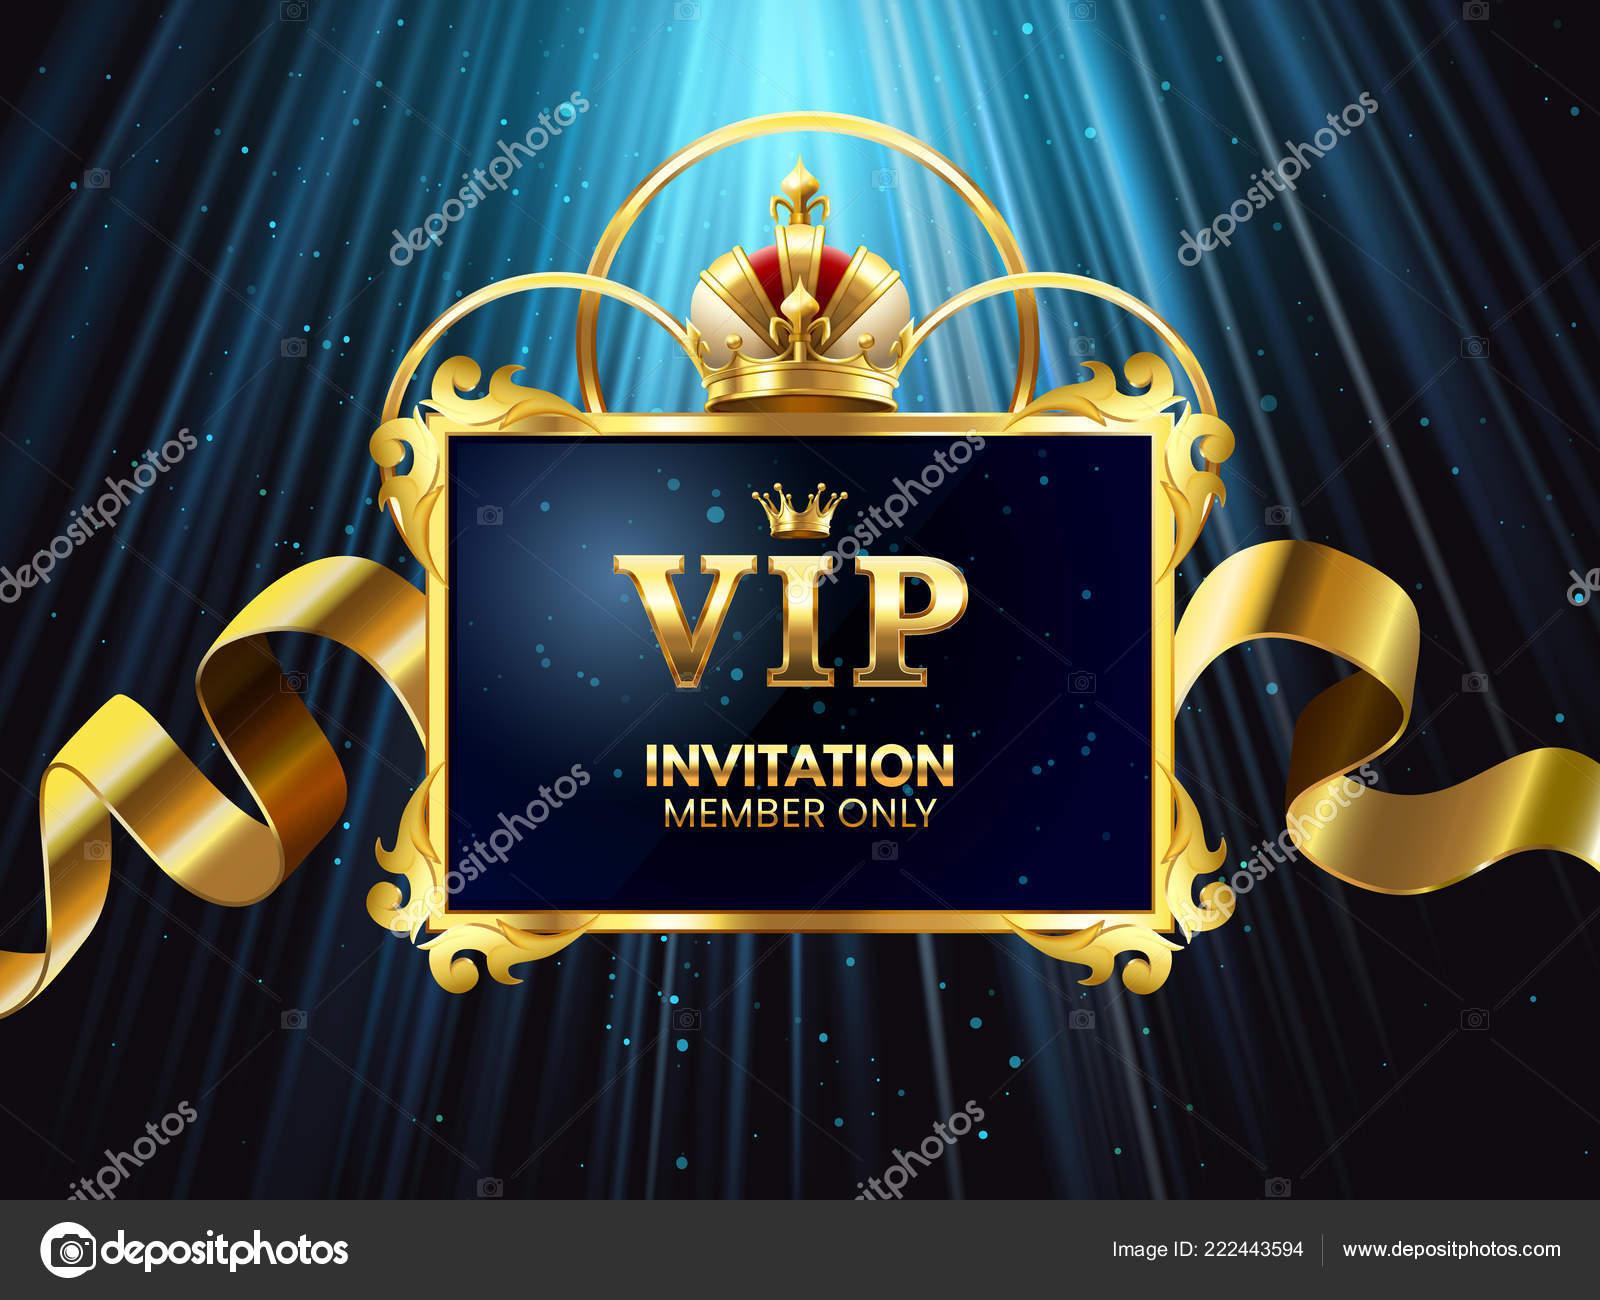 Vip Karta Pozvani Glamour Oslava Invitate Elegantni Zlata Koruna